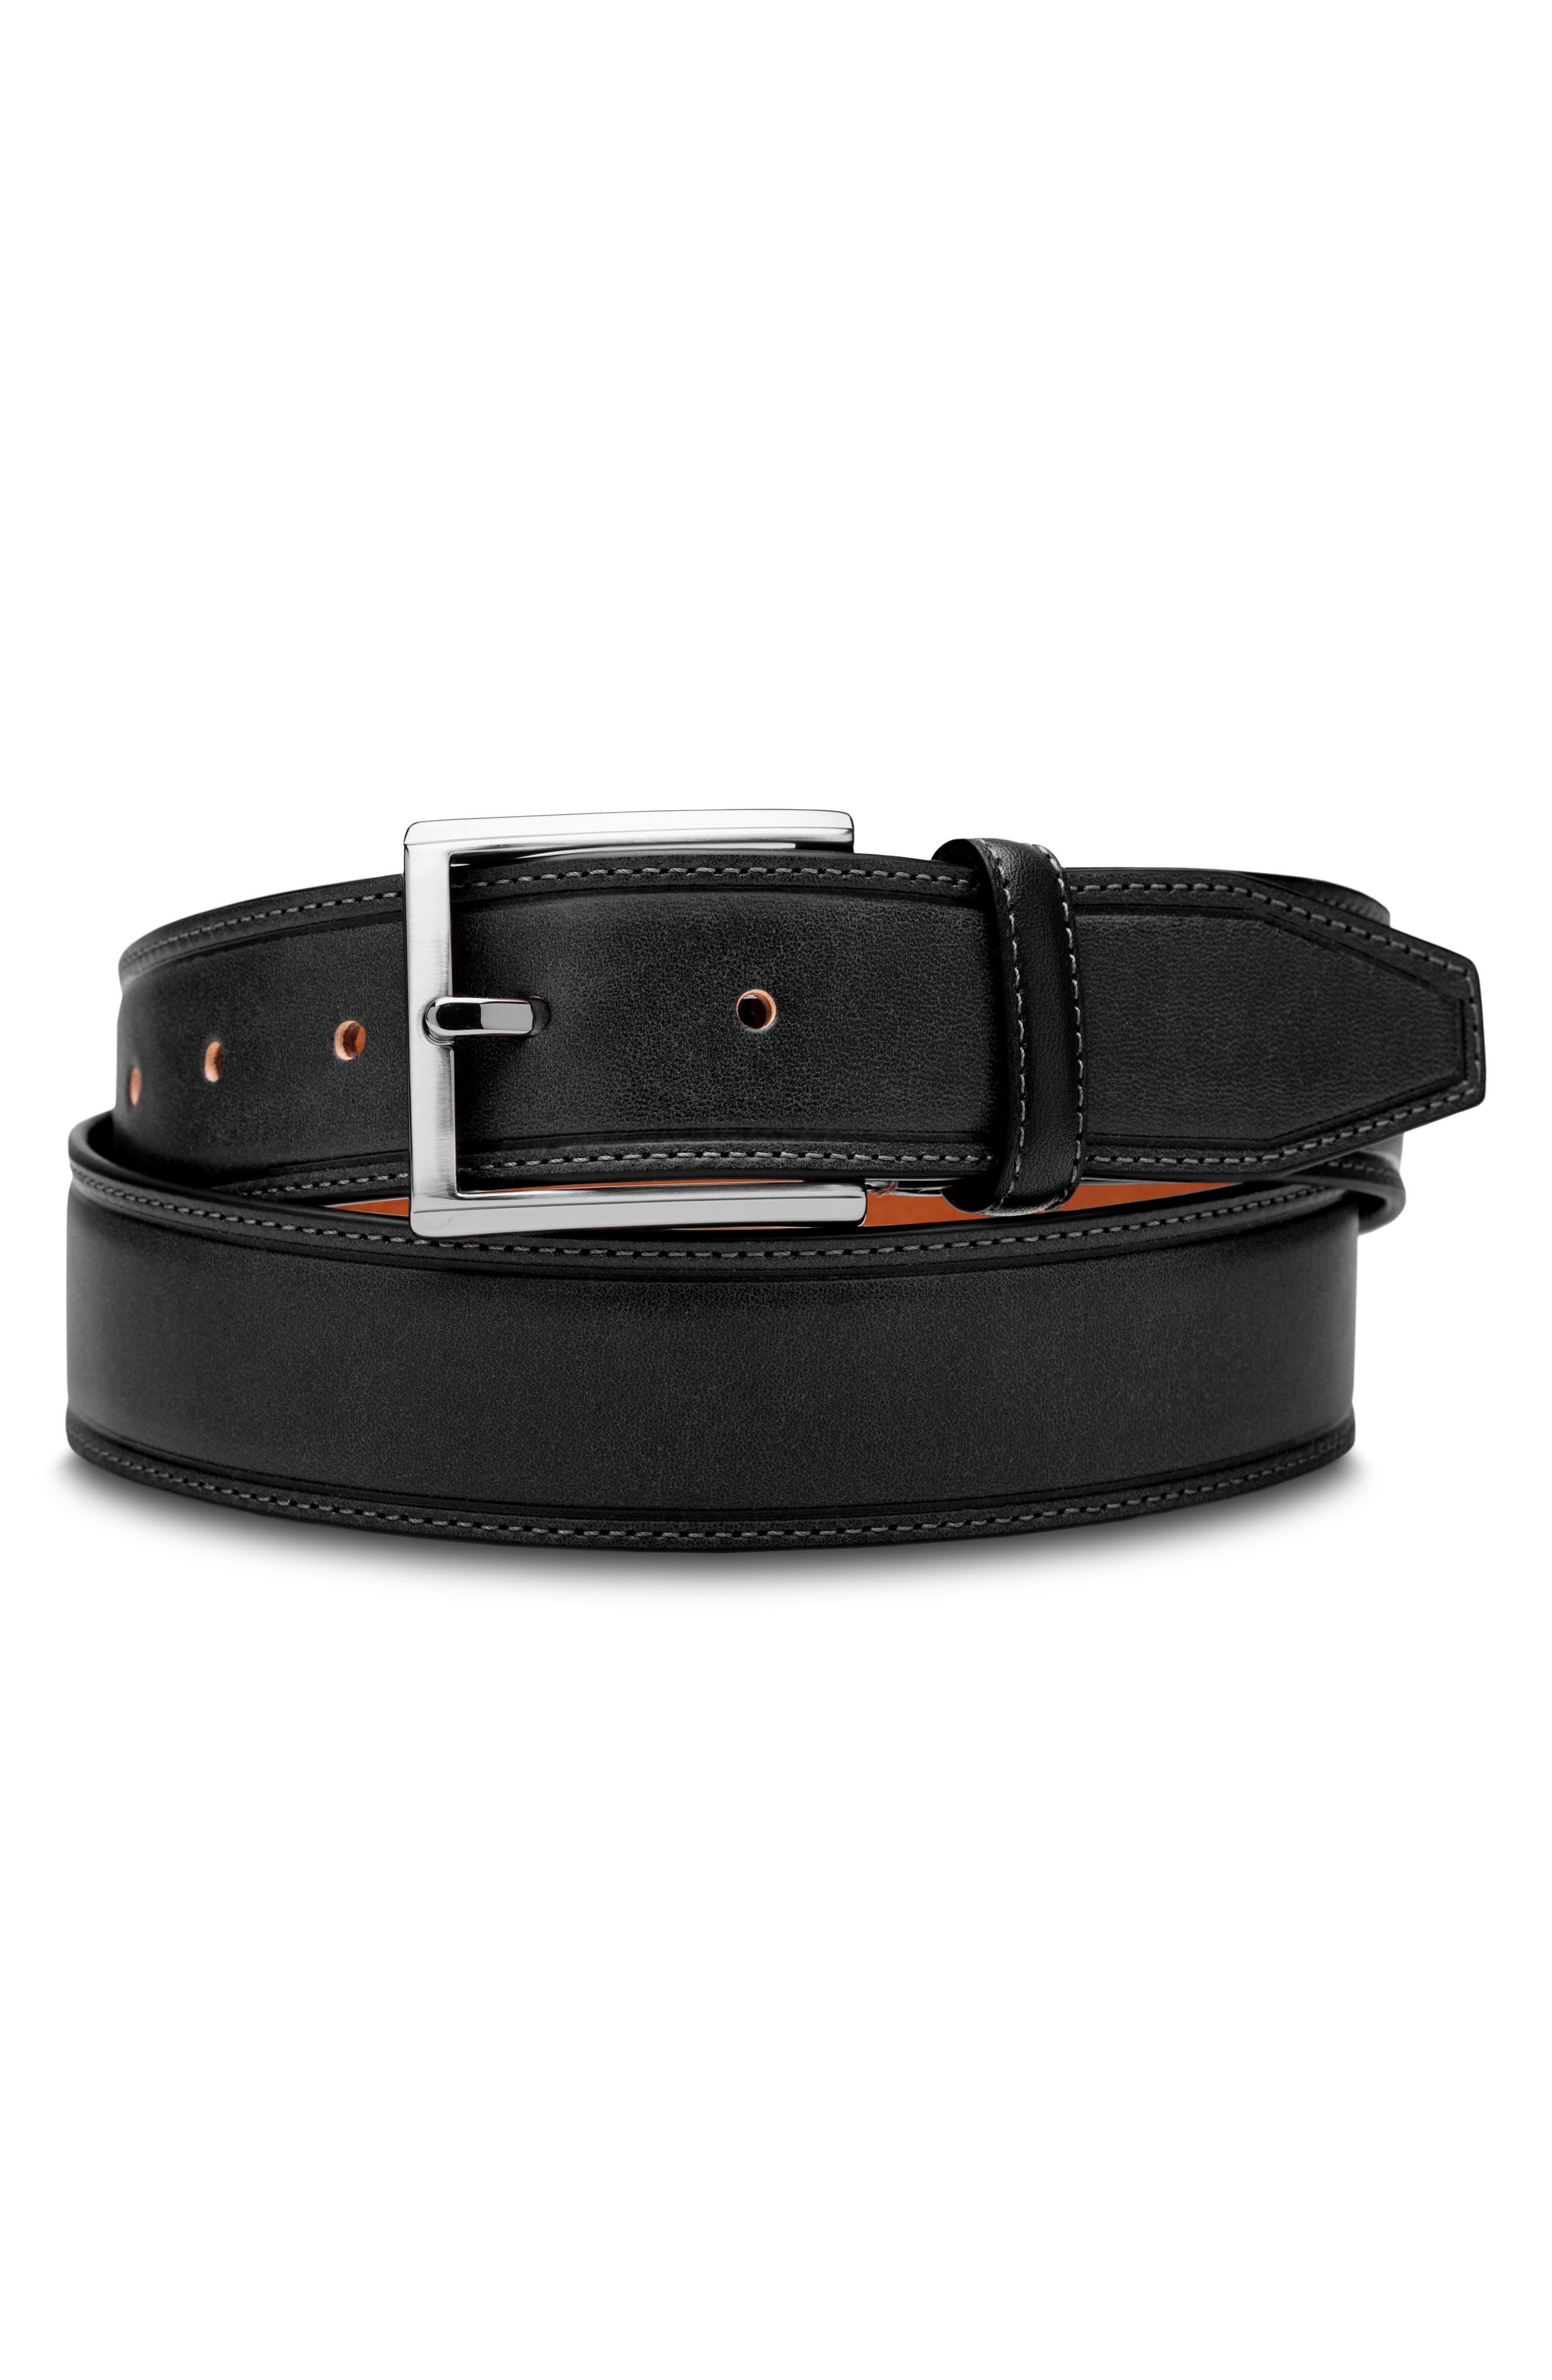 Salerno Leather Belt